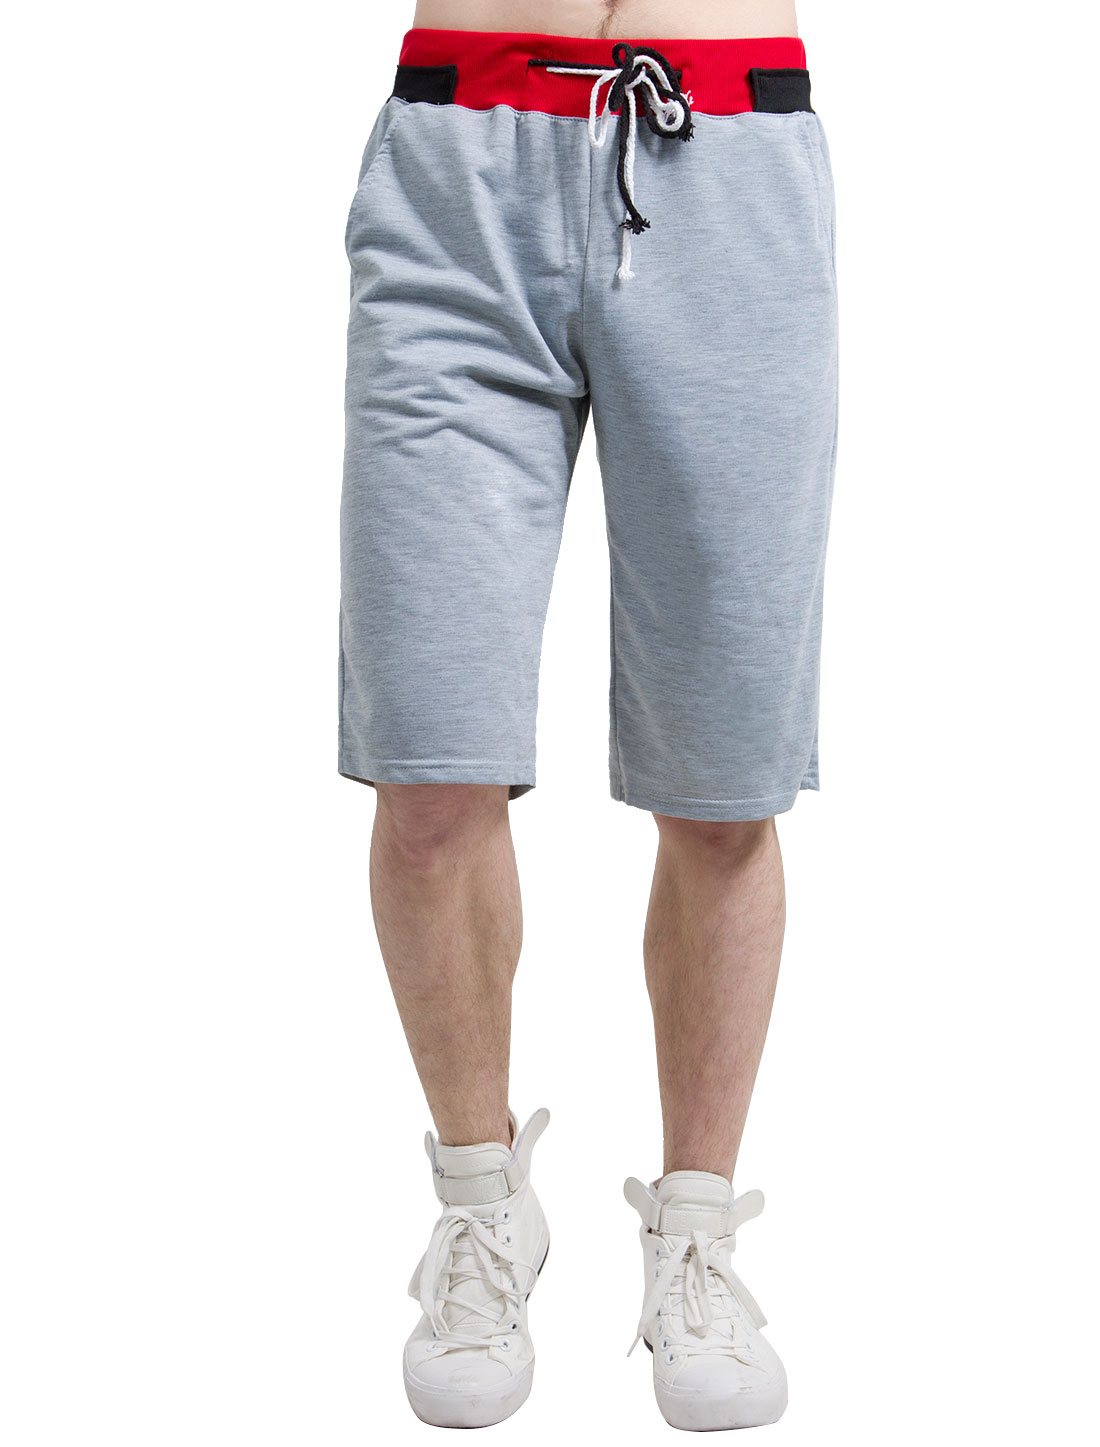 Men Color-blocking Waistband Straight Sport Shorts Light Gray W36